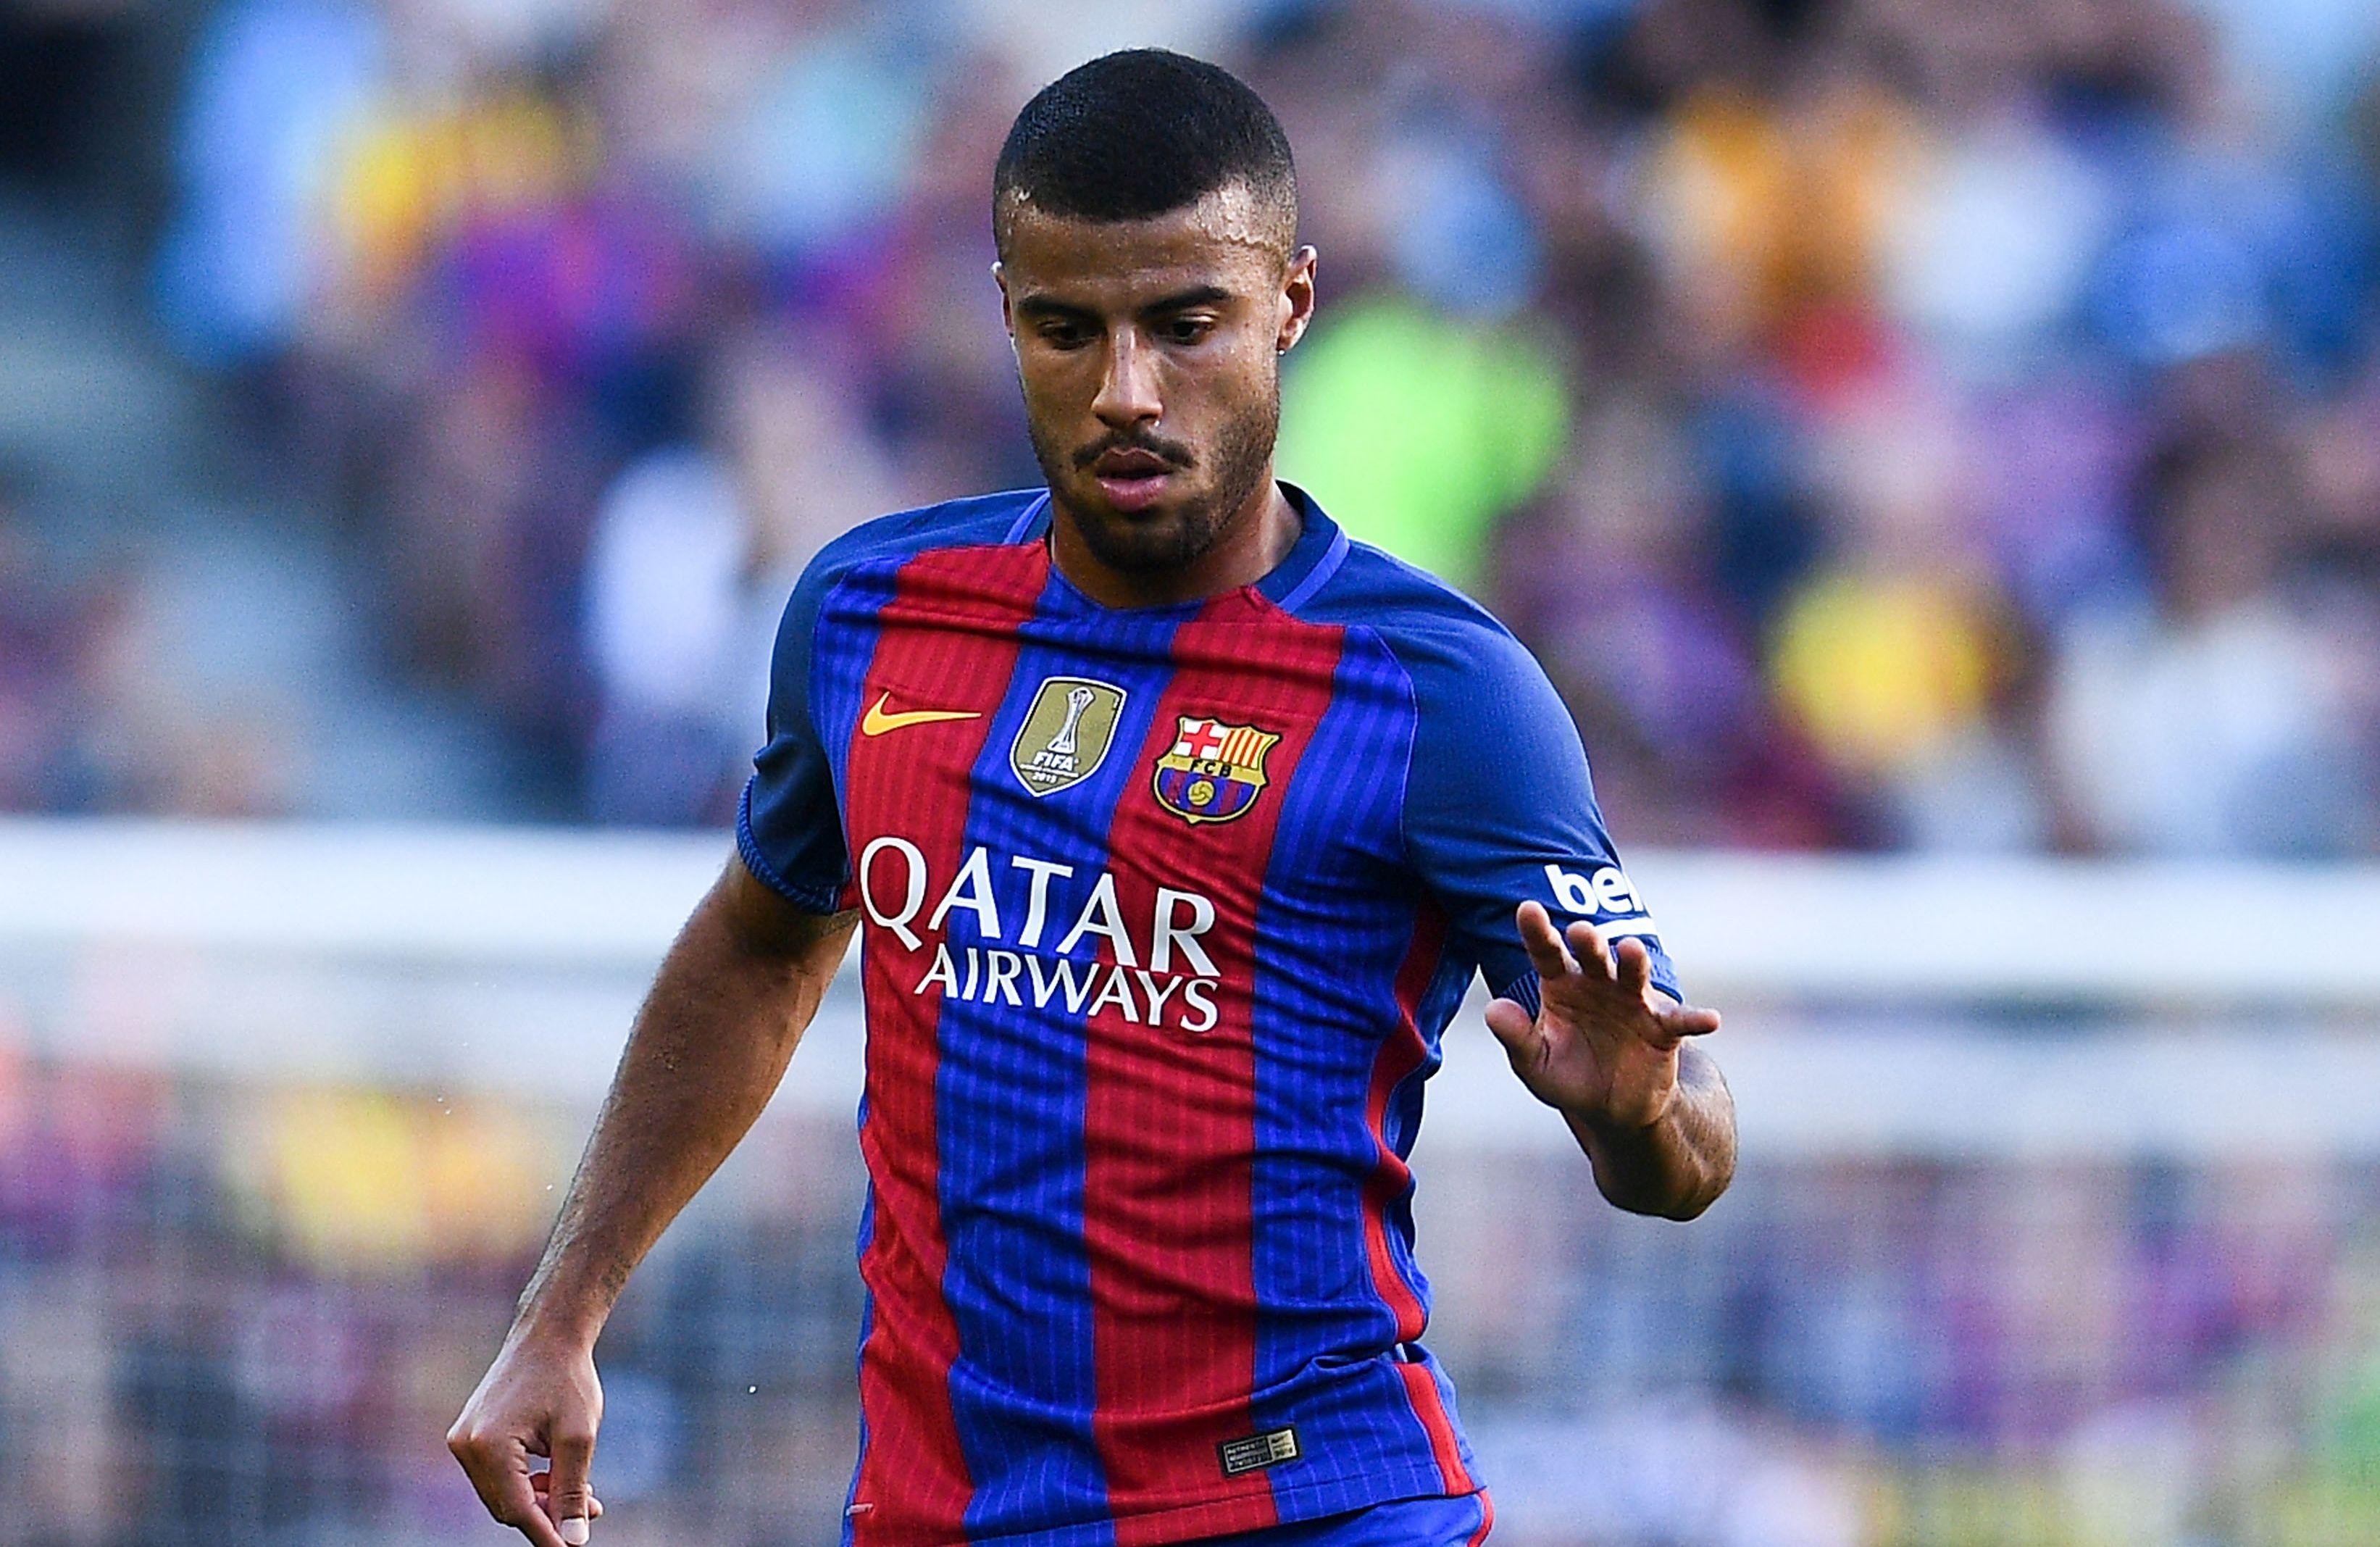 Преговорите между Барселона и Интер за трансфера на Рафиня в